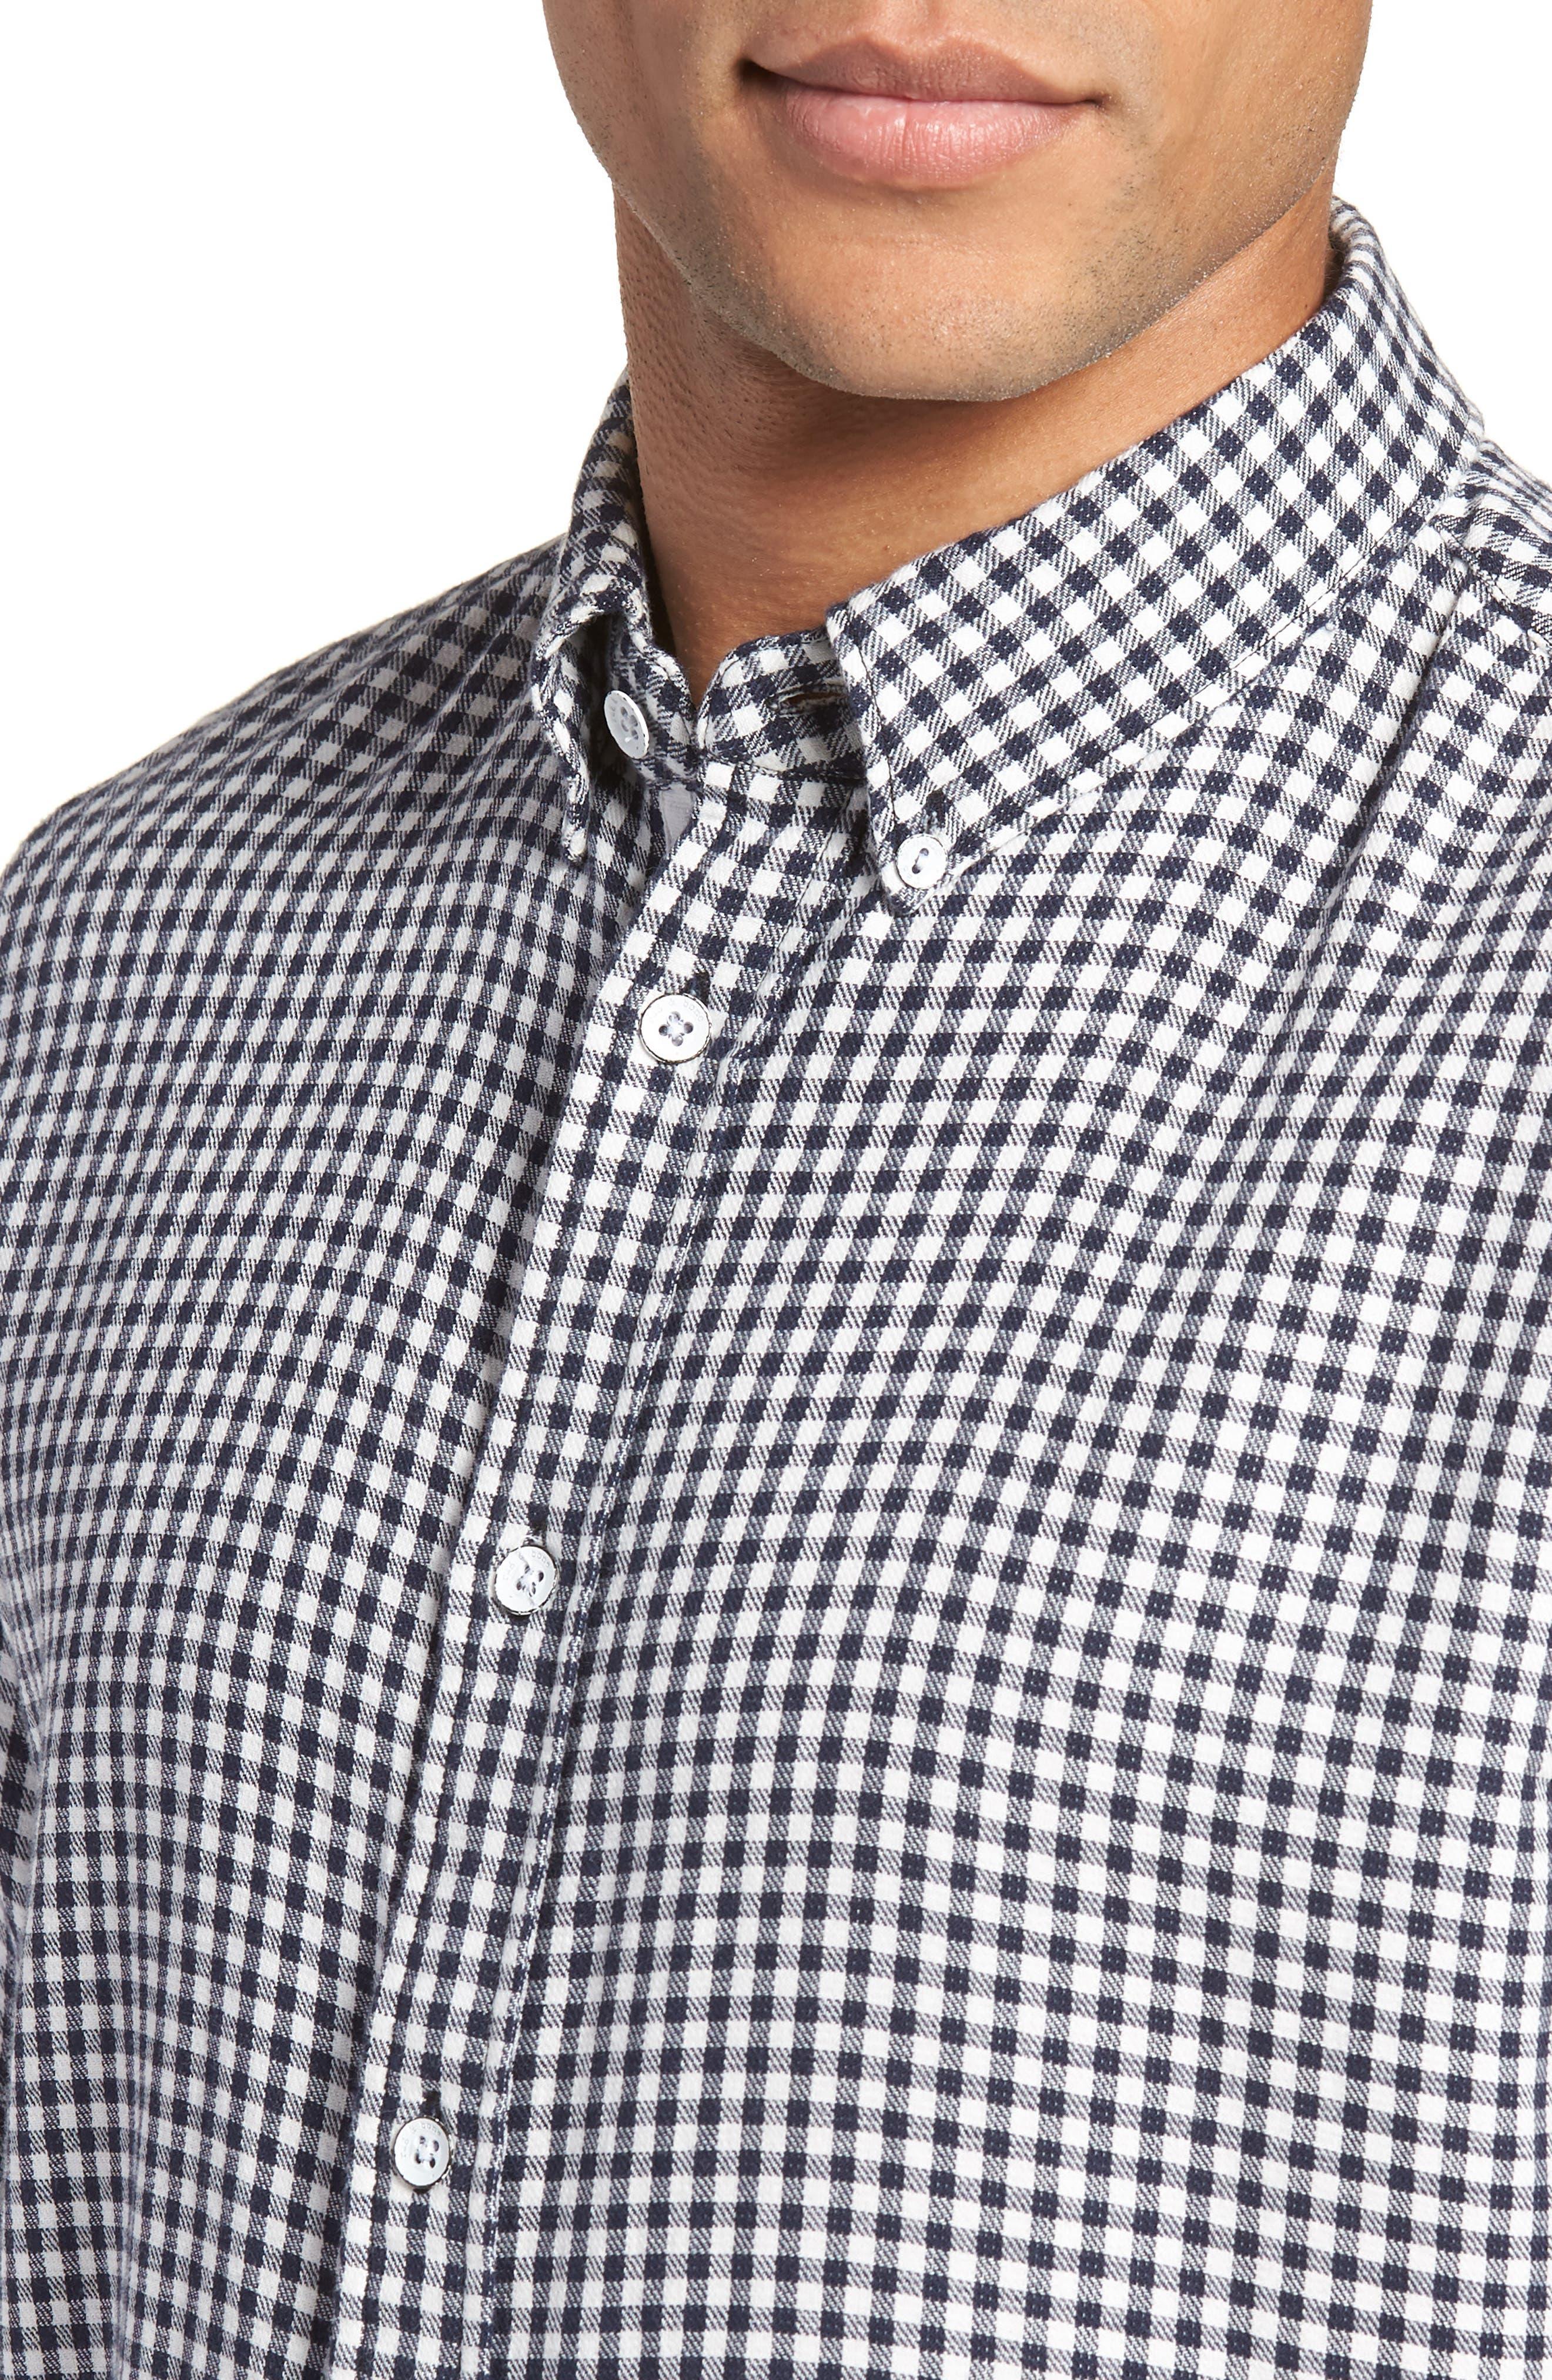 Fit 2 Tomlin Check Sport Shirt,                             Alternate thumbnail 4, color,                             NAVY GINGHAM